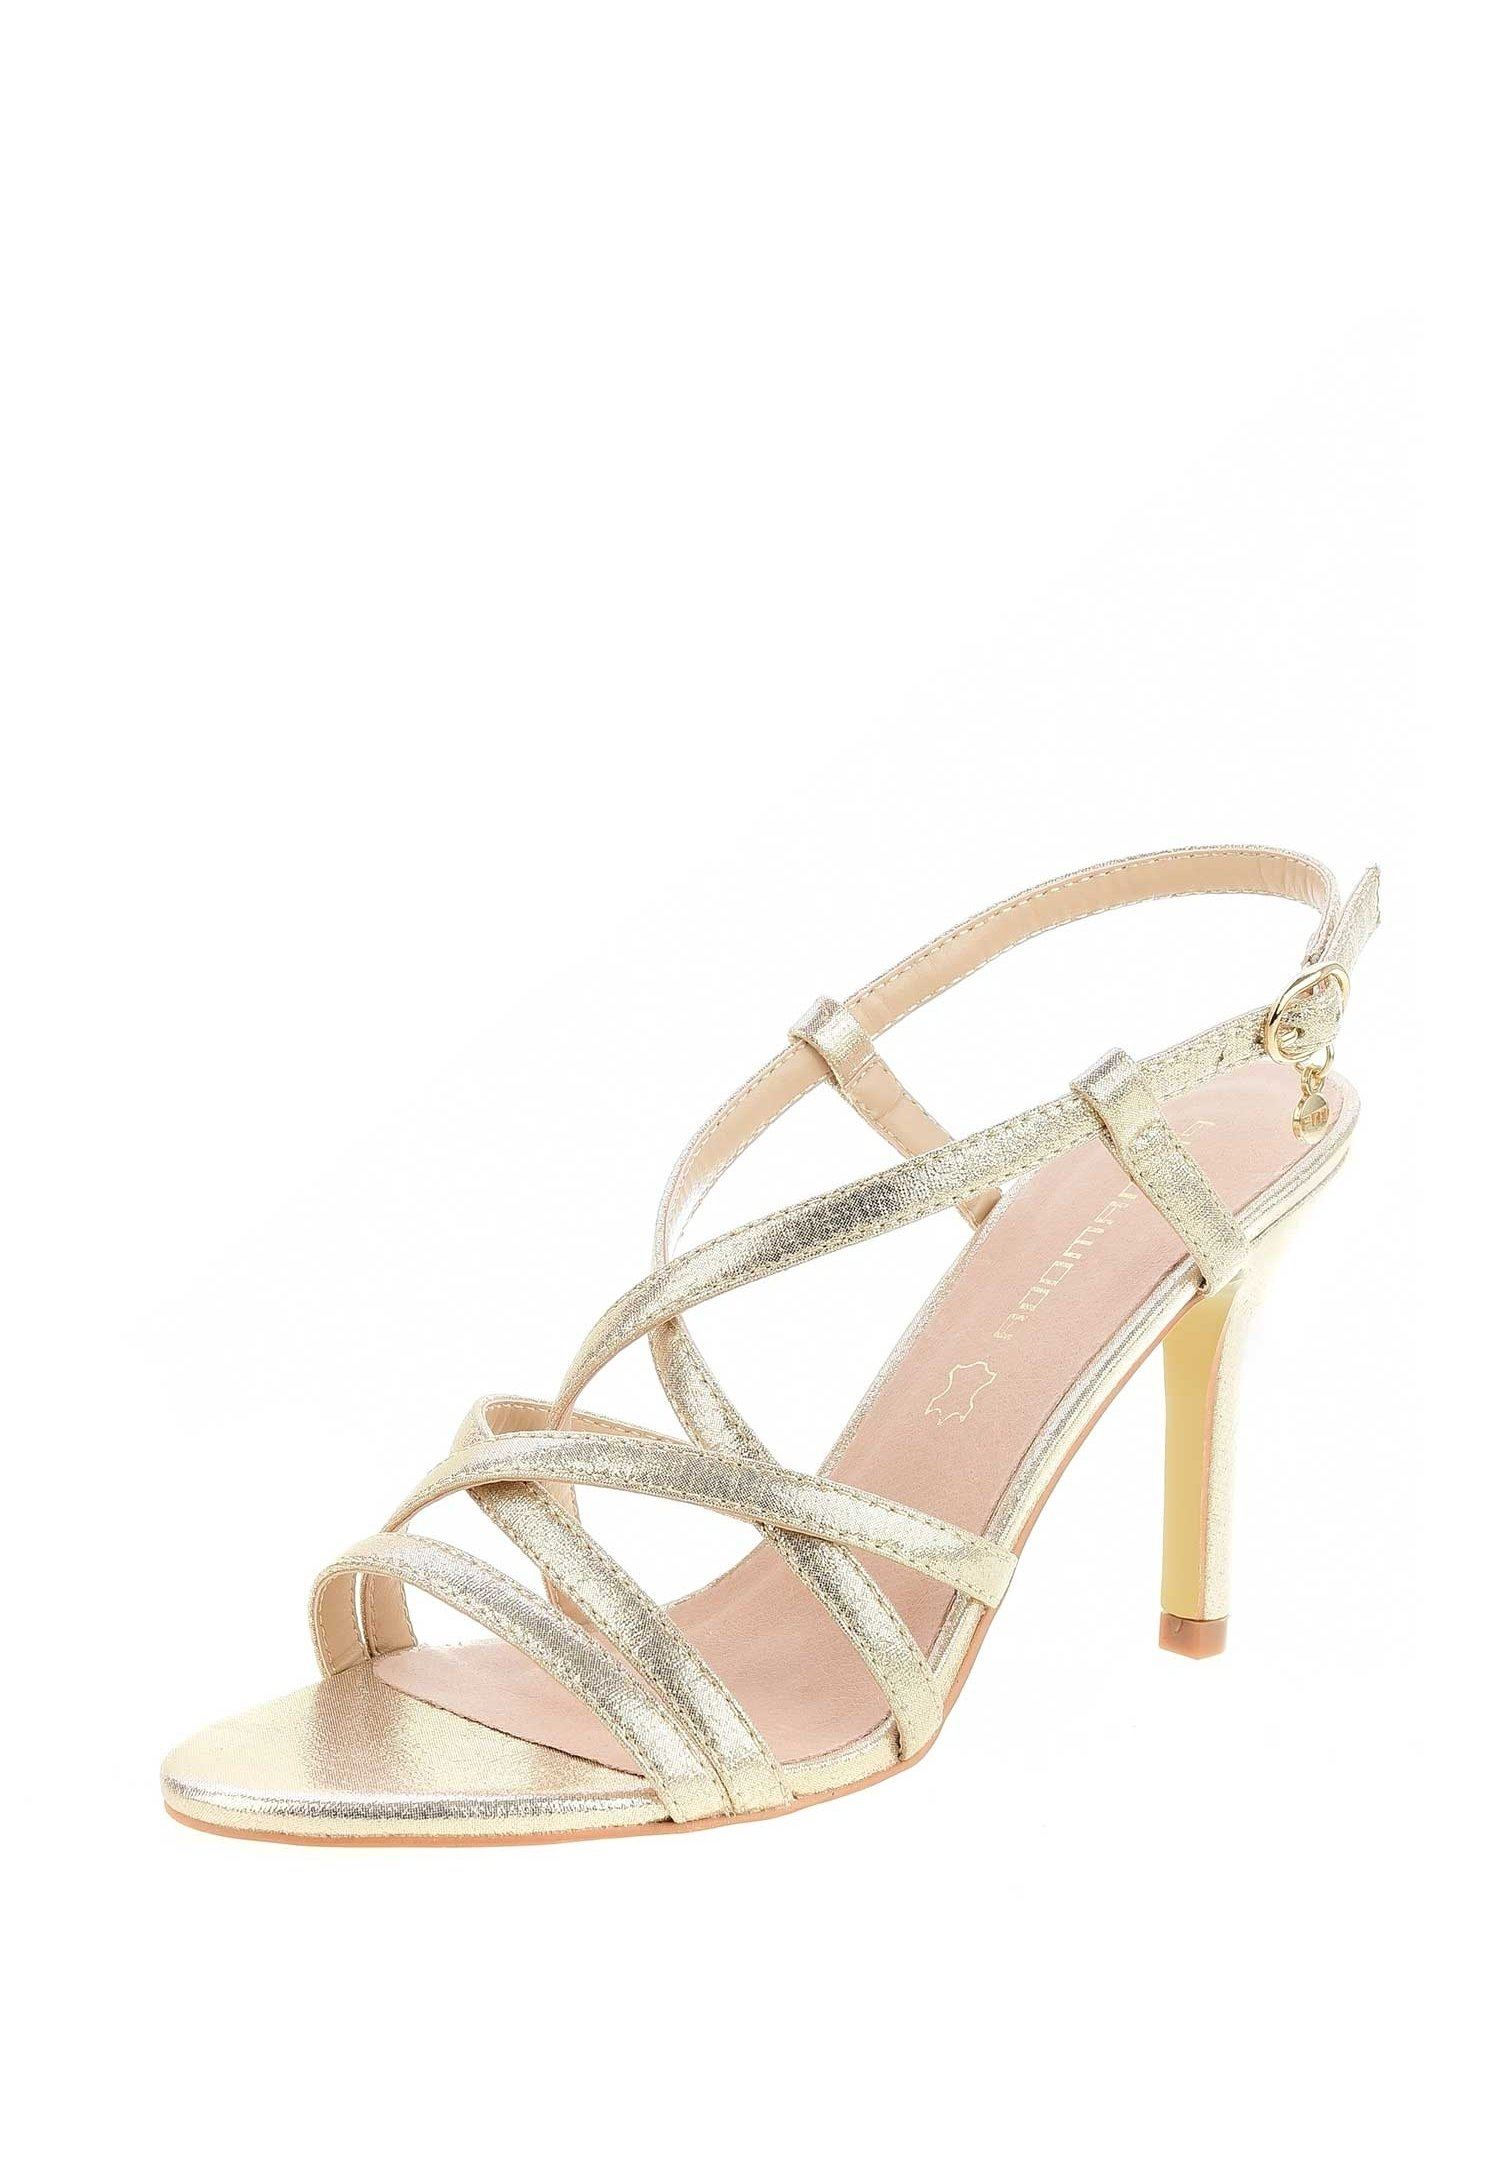 PRIMA MODA ZUMPANO High Heel Sandalette gold